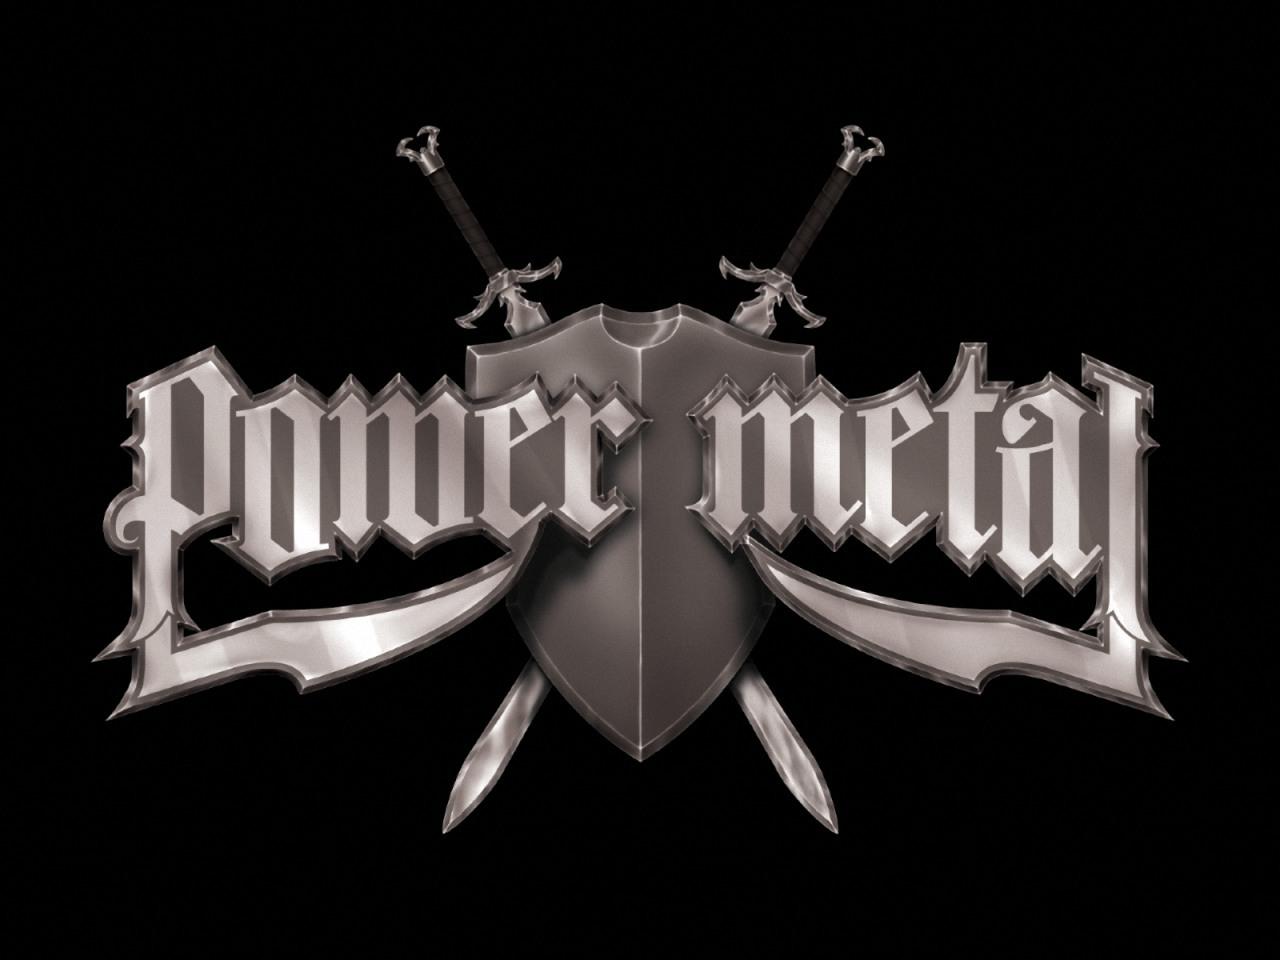 Powerwolf Wallpapers Pc Main Subgenres Of Metal 1192856